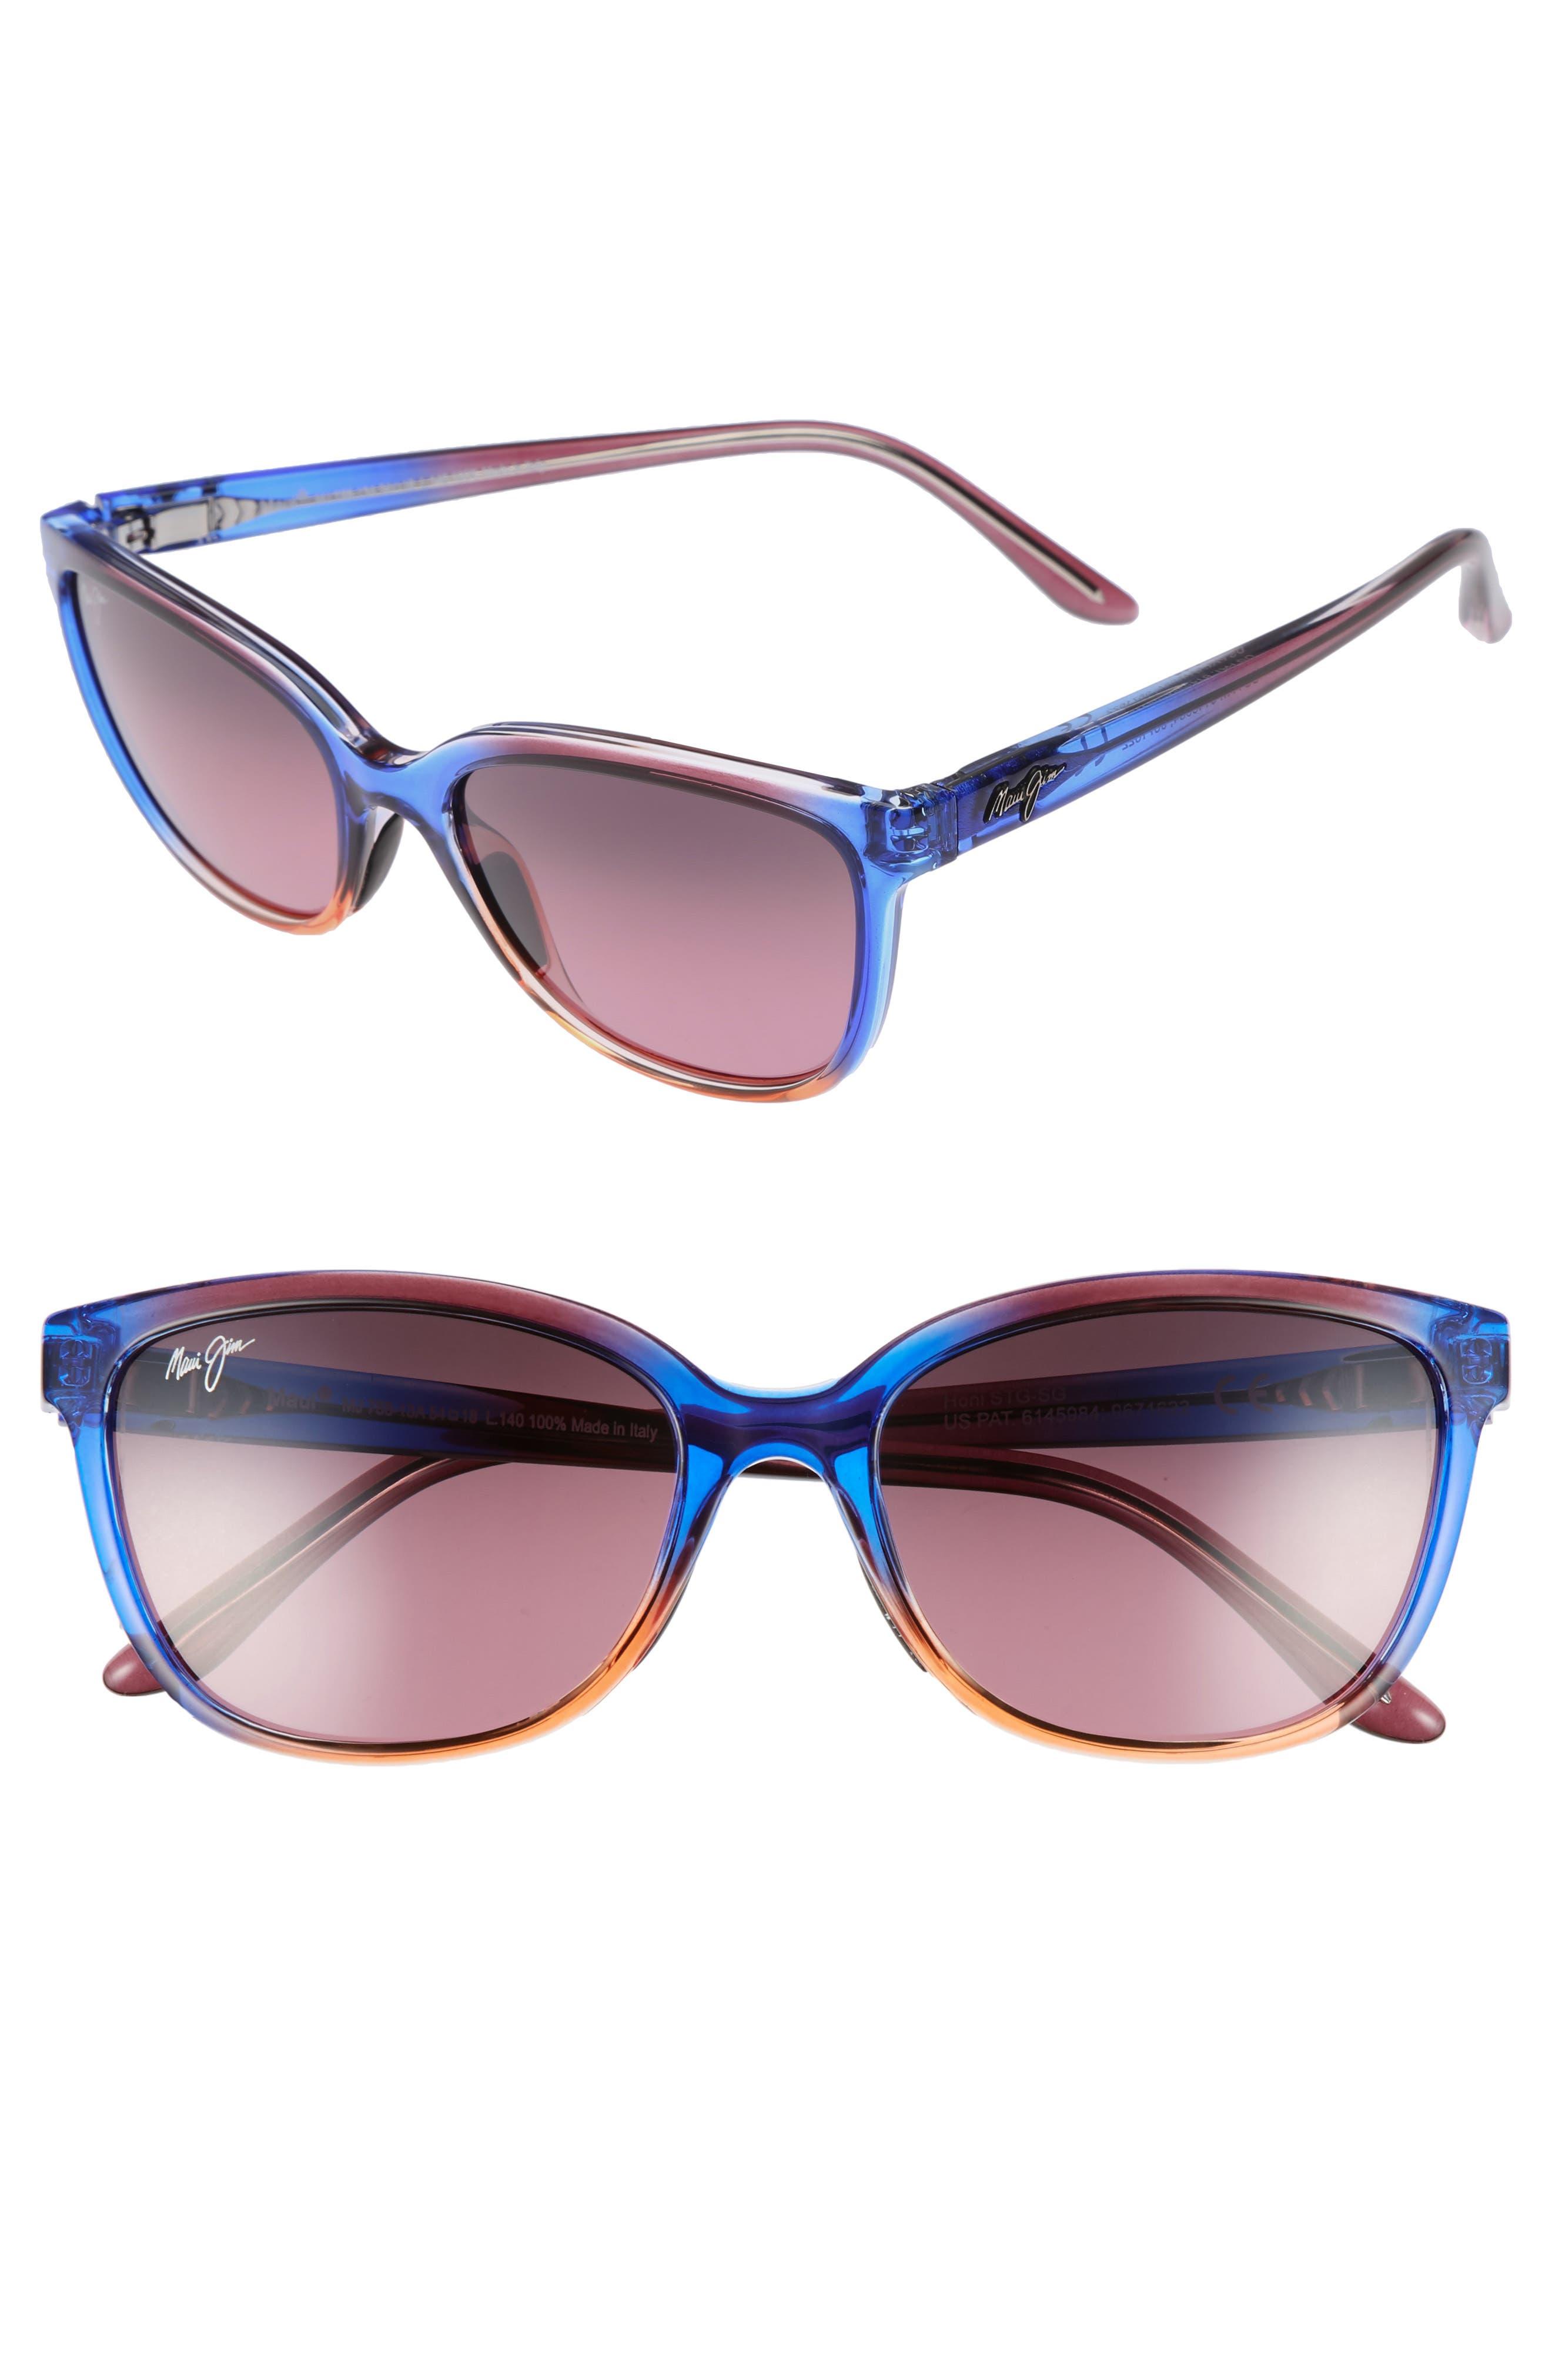 Honi 54mm Polarized Cat Eye Sunglasses,                         Main,                         color, Sunset/ Maui Rose